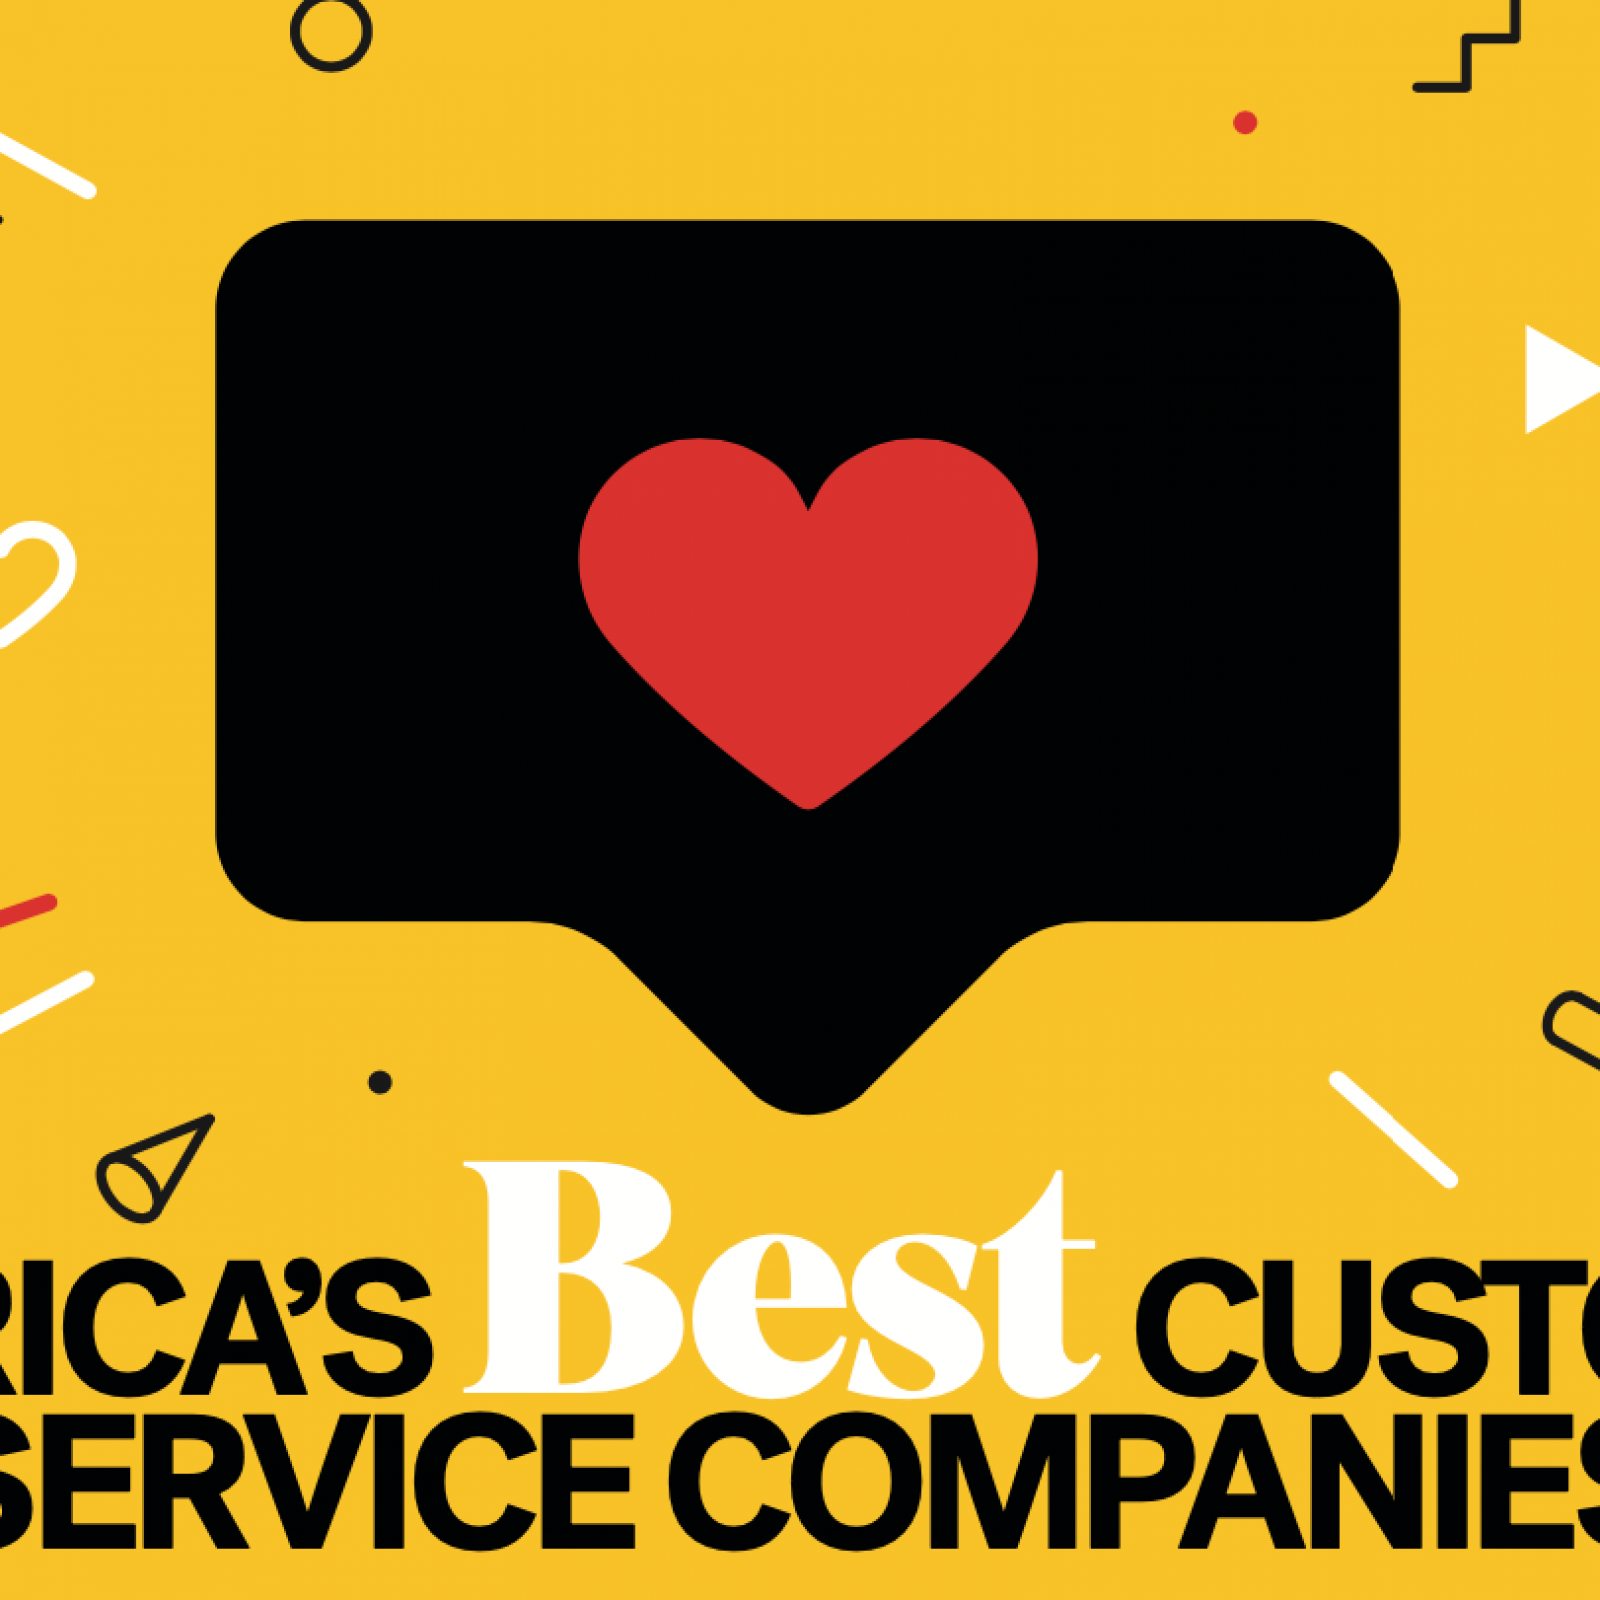 Eddie Bauer 2021 Cusotmer Serivce Christmas America S Best Customer Service 2021